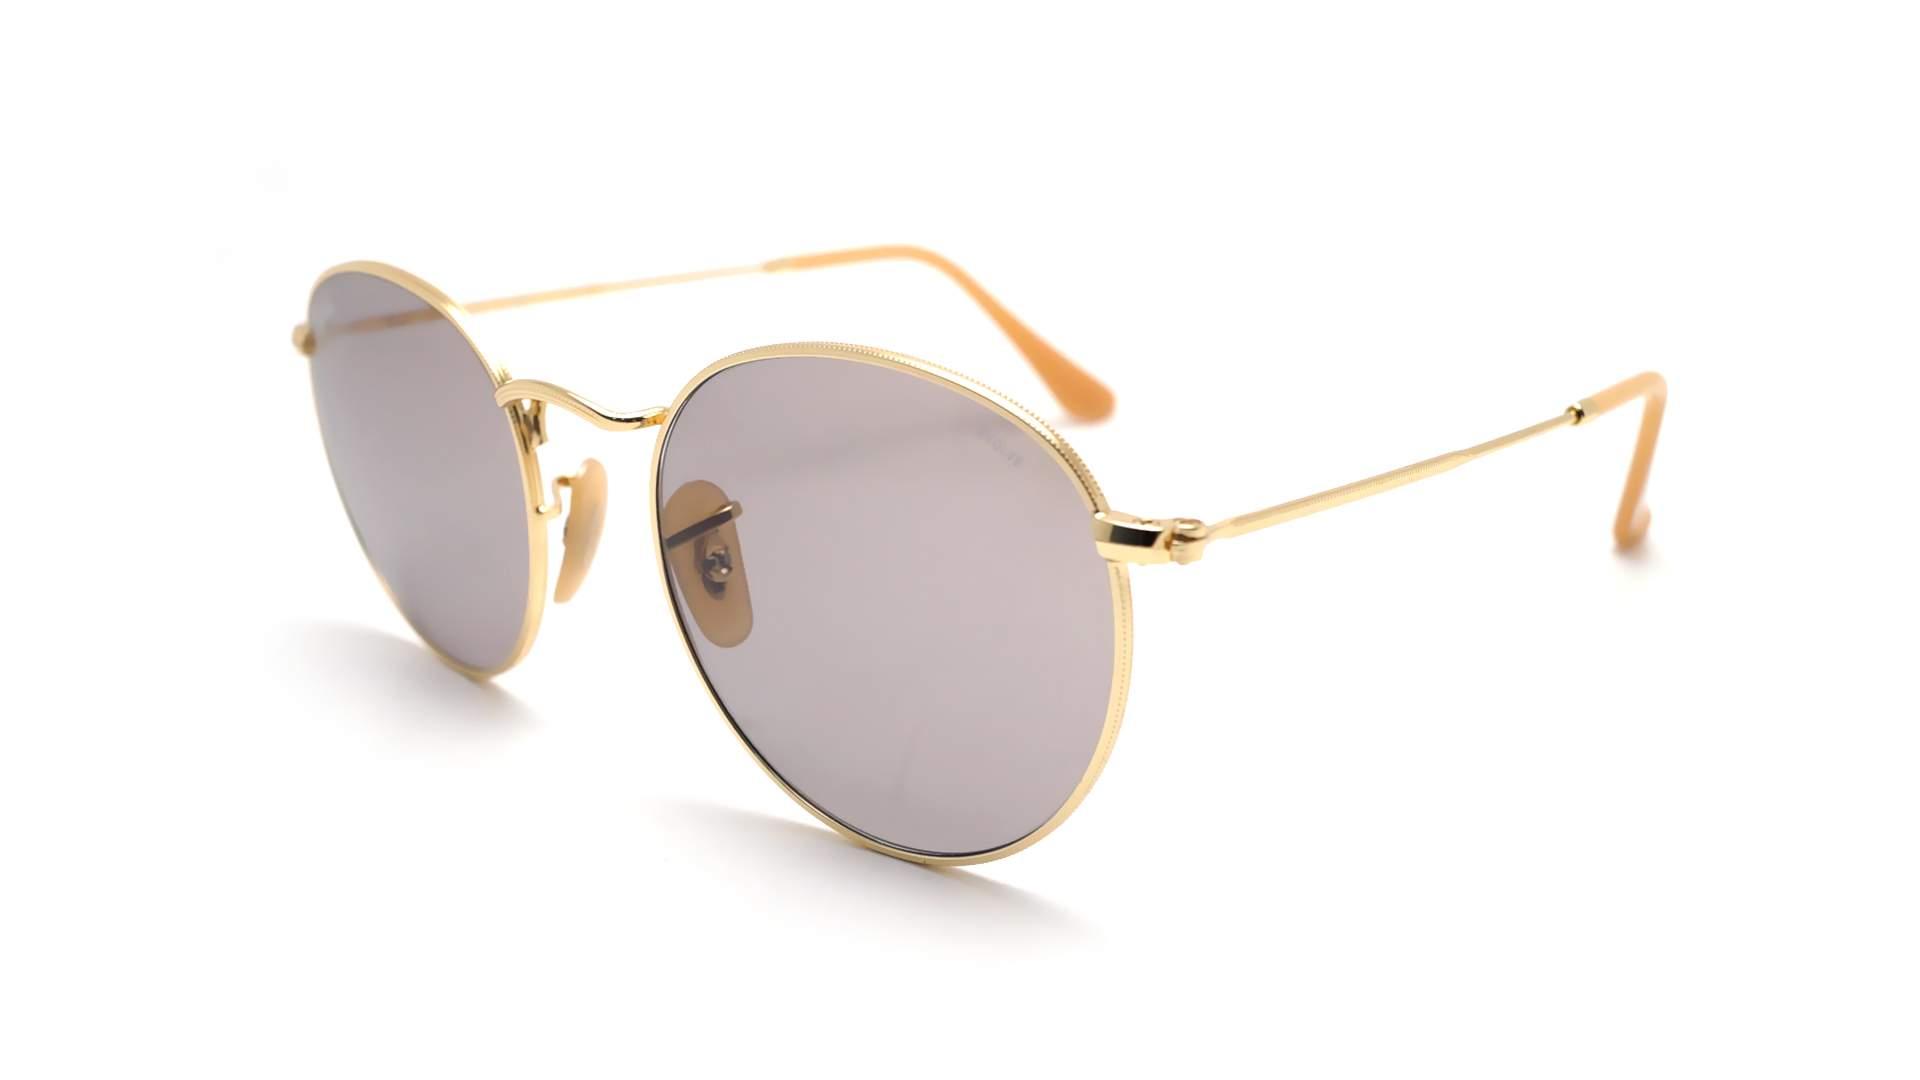 d8a670d6877 Sunglasses Ray-Ban Round Evolve Gold RB3447 9064 V8 50-21 Medium  Photochromic